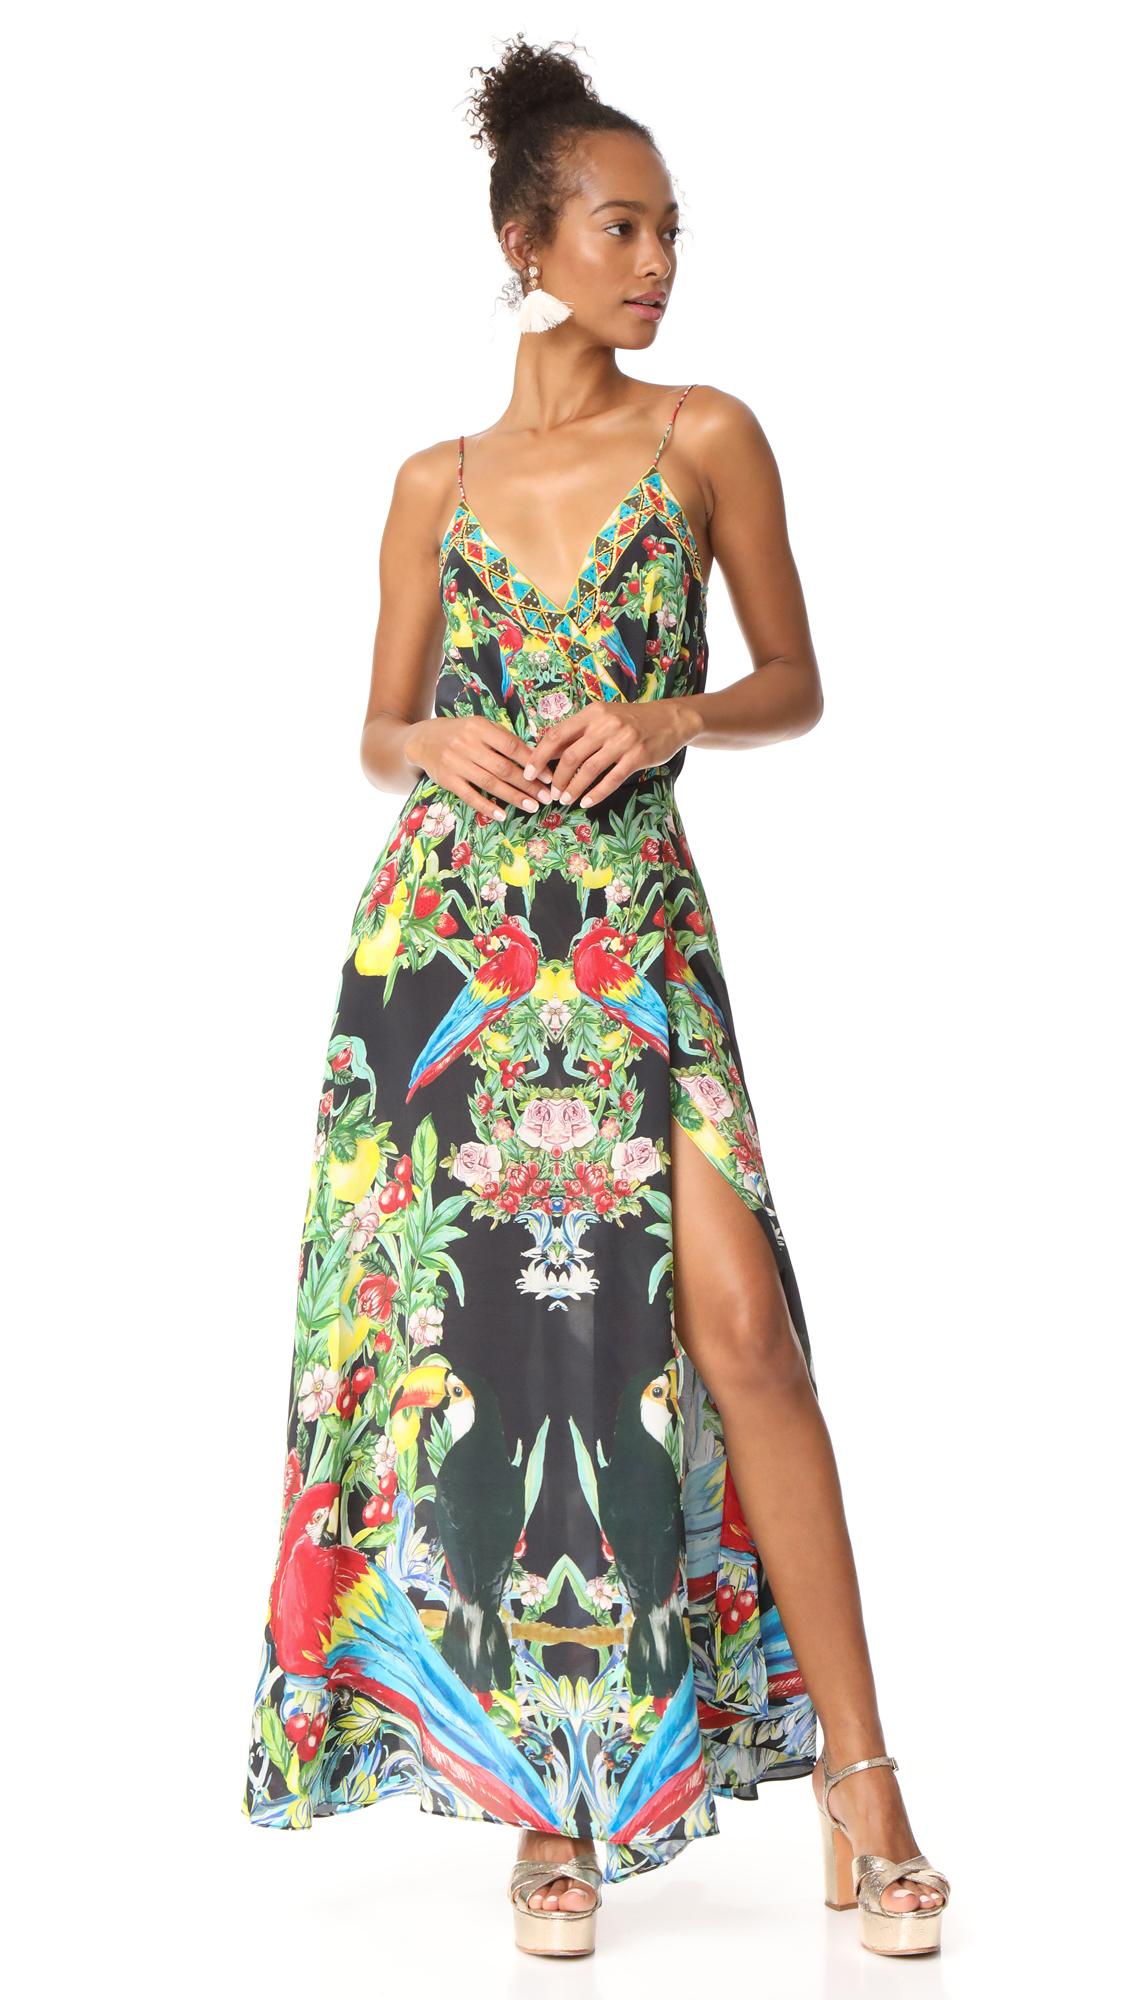 Camilla Toucan Play Wrap Dress - Toucan Play